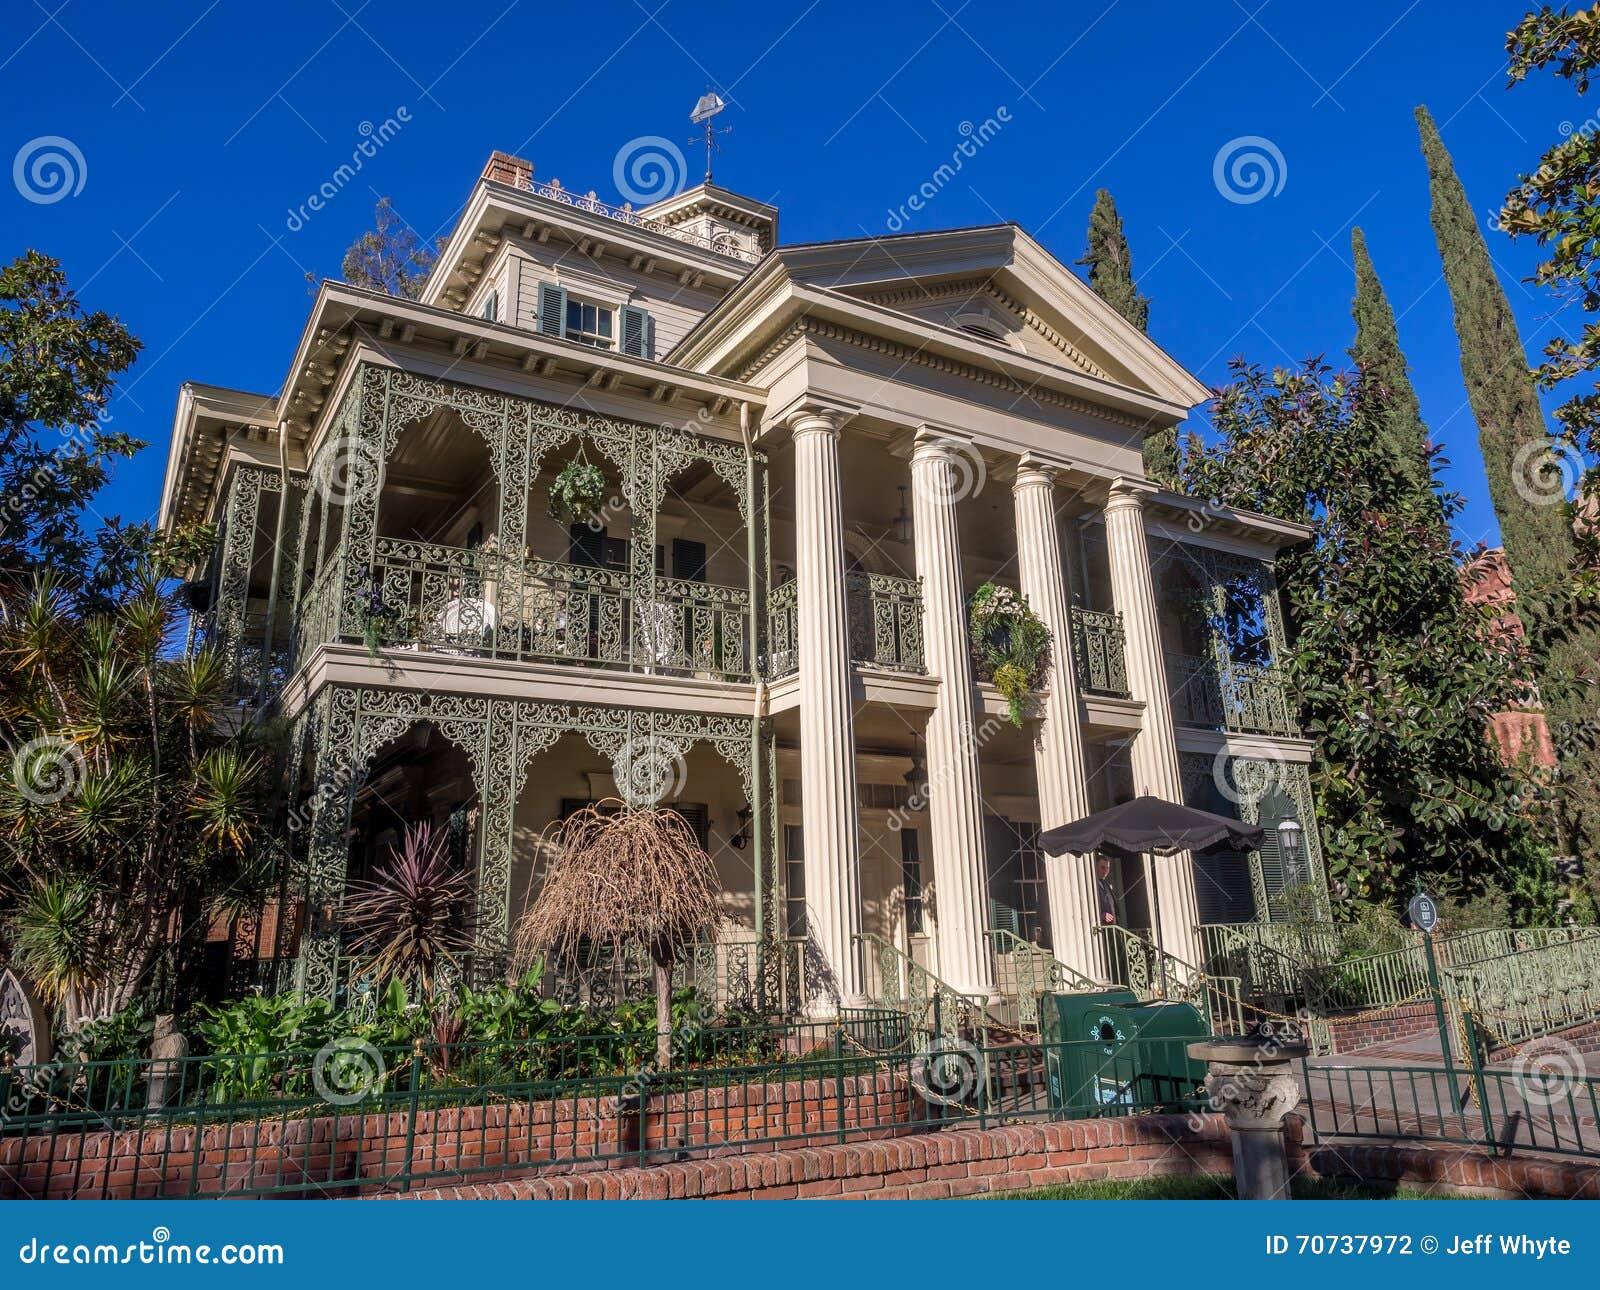 Haunted Mansion Ride At Disneyland Park Editorial ...